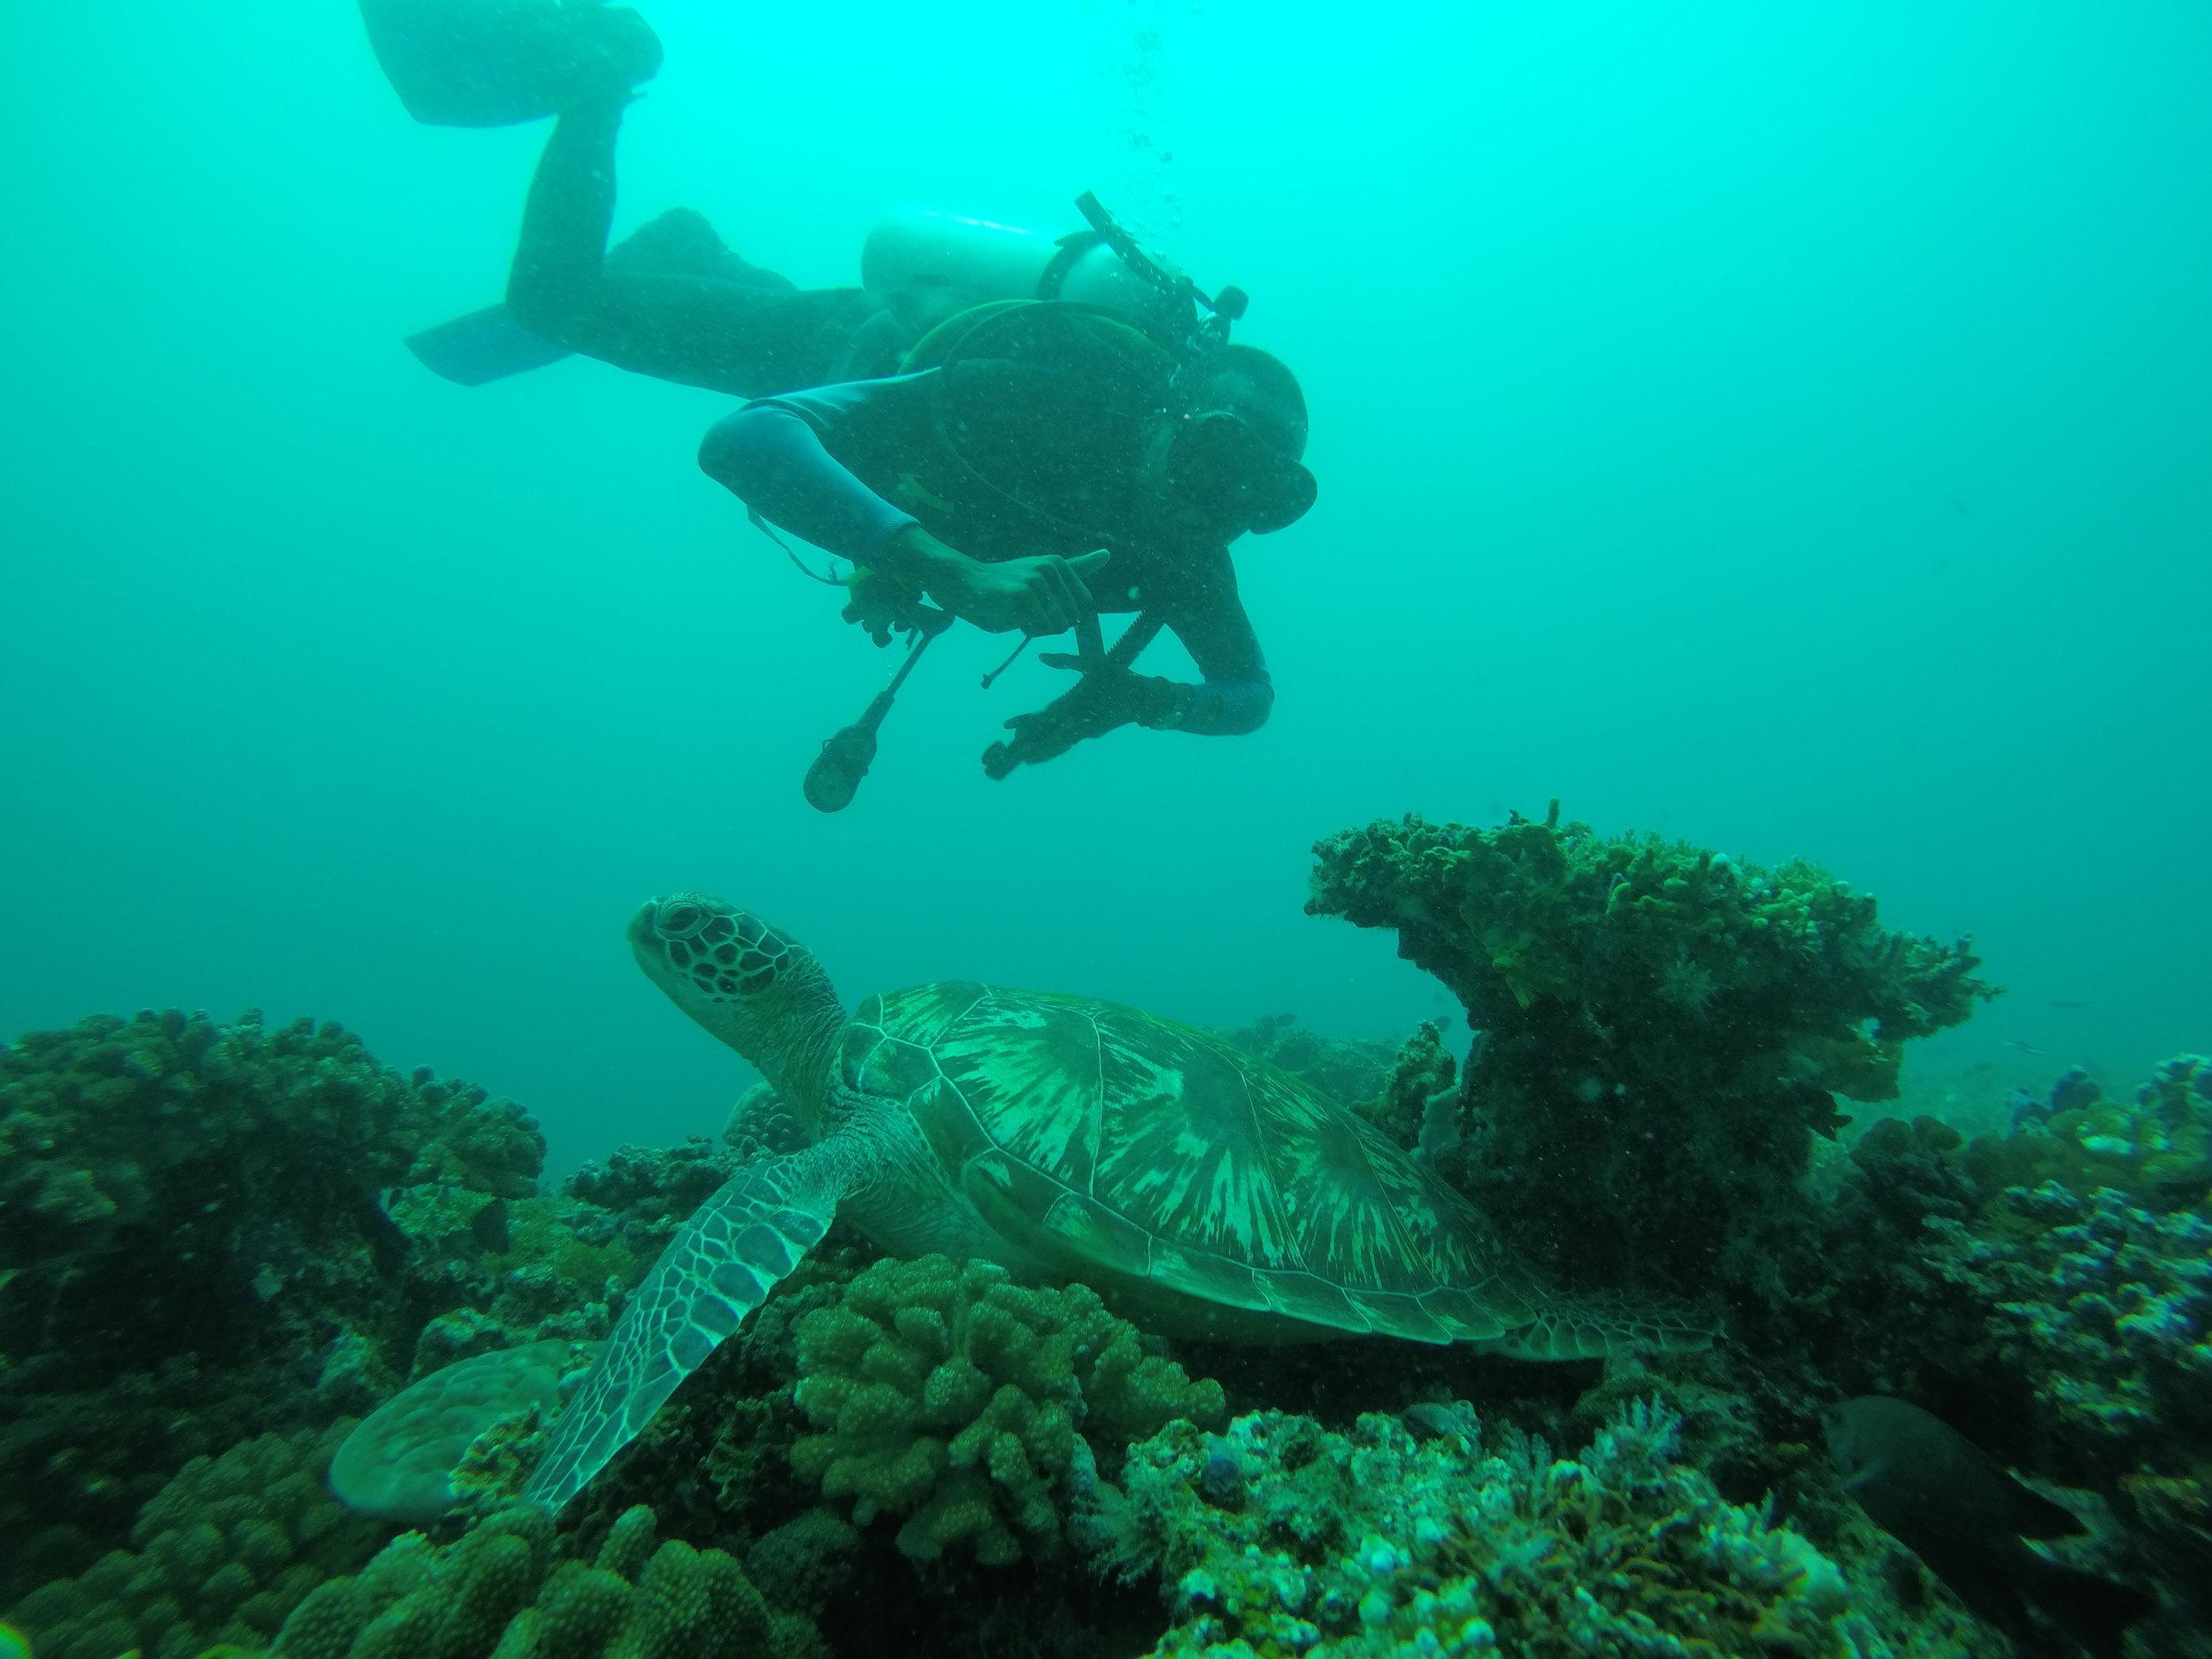 Snorkeling in Bali